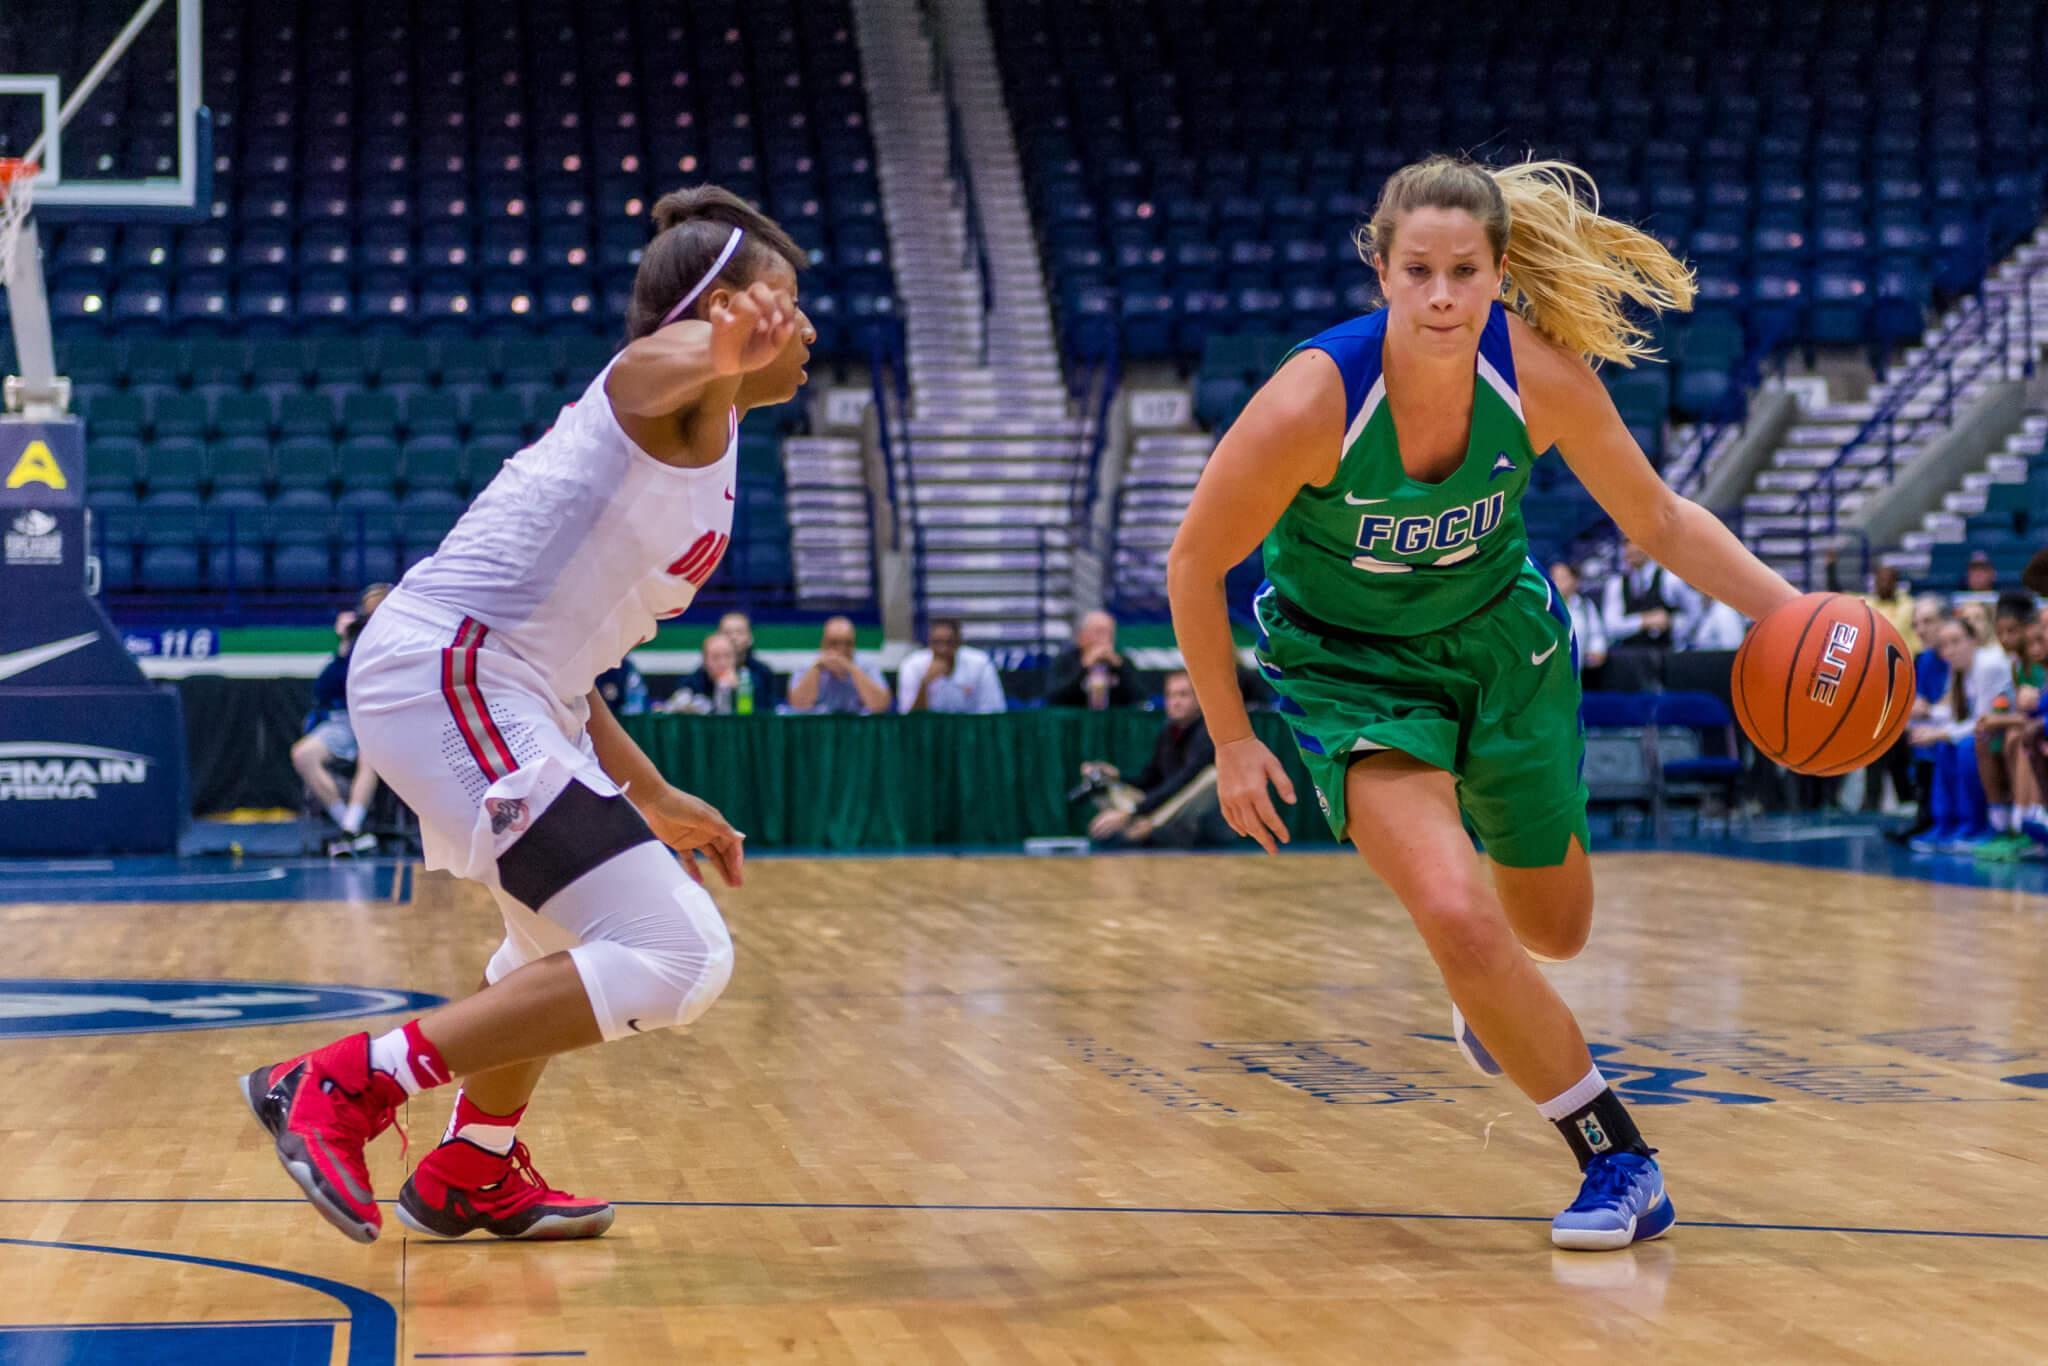 FGCU women's basketball falls to No. 8 Ohio State